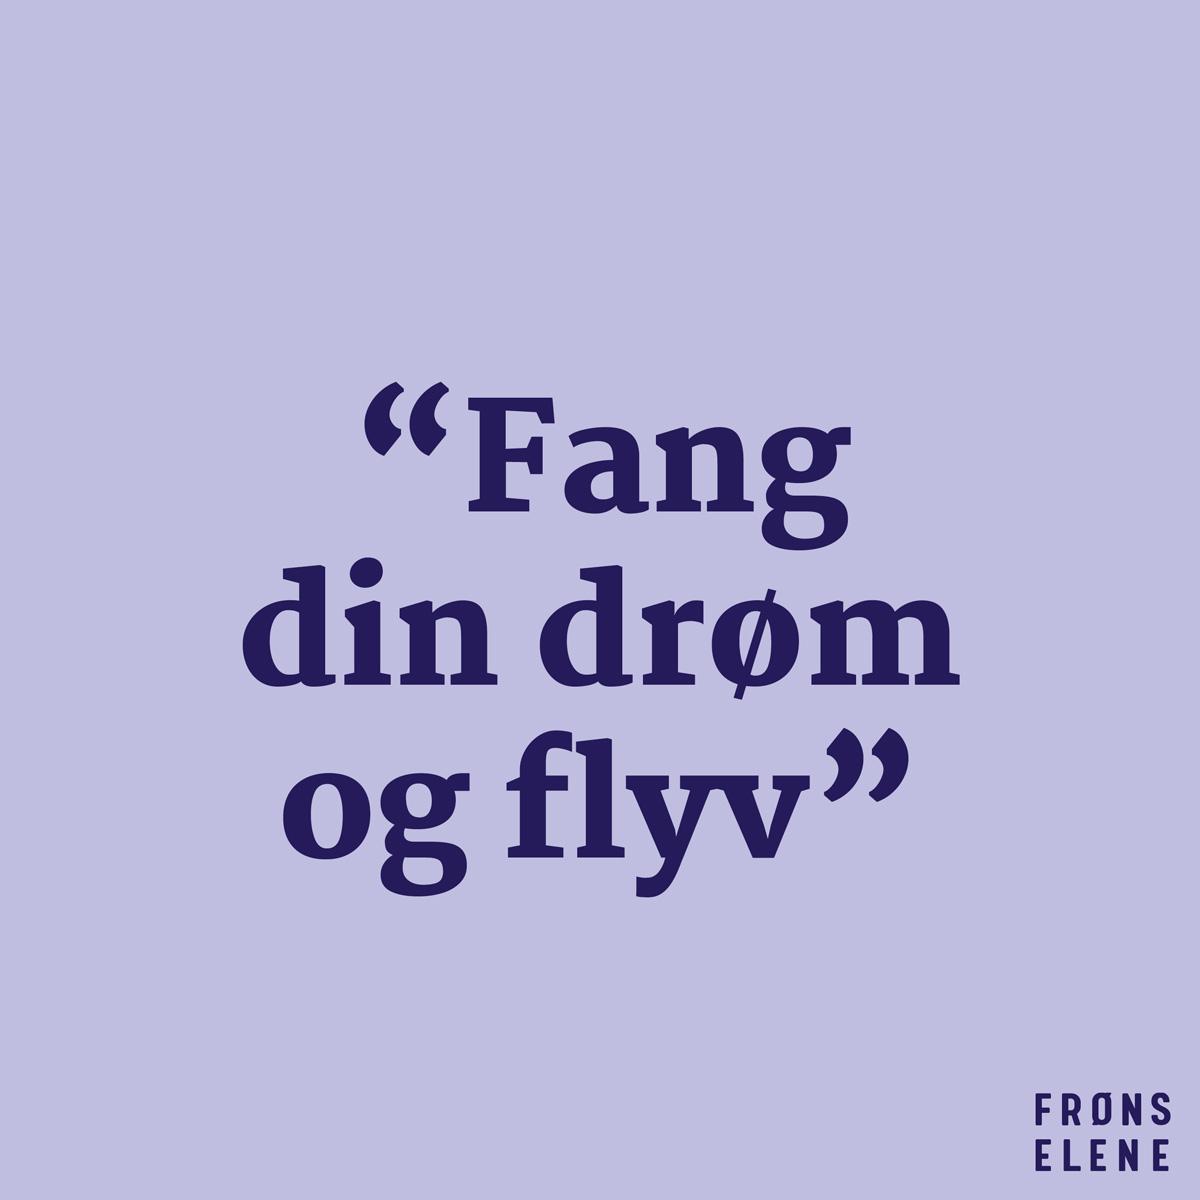 Frøns Elene statement